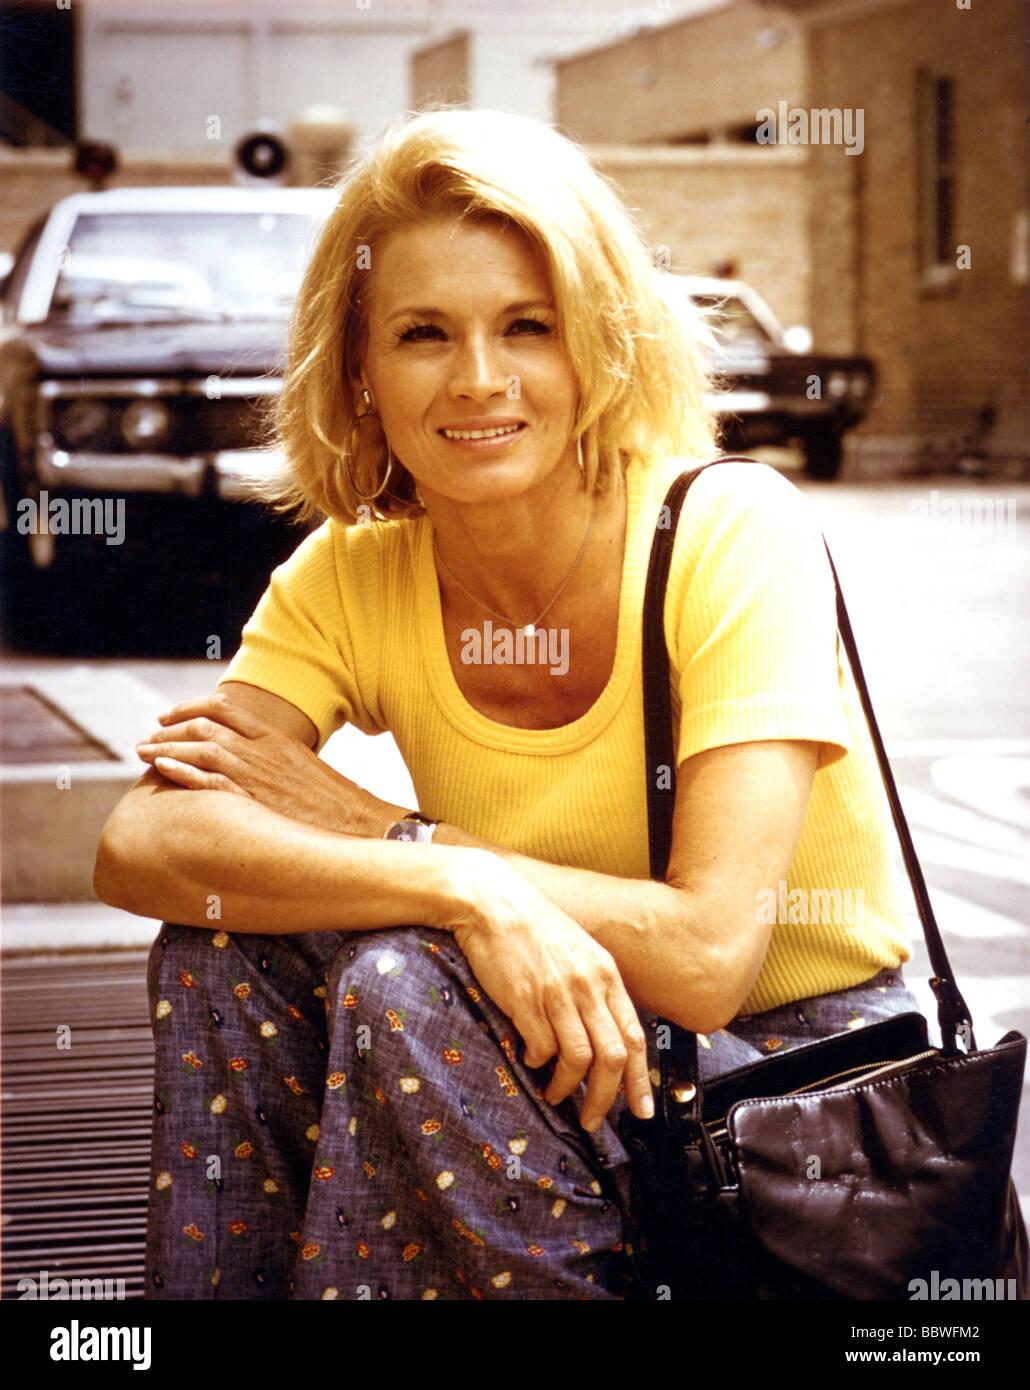 1970s woman stock photos & 1970s woman stock images - alamy